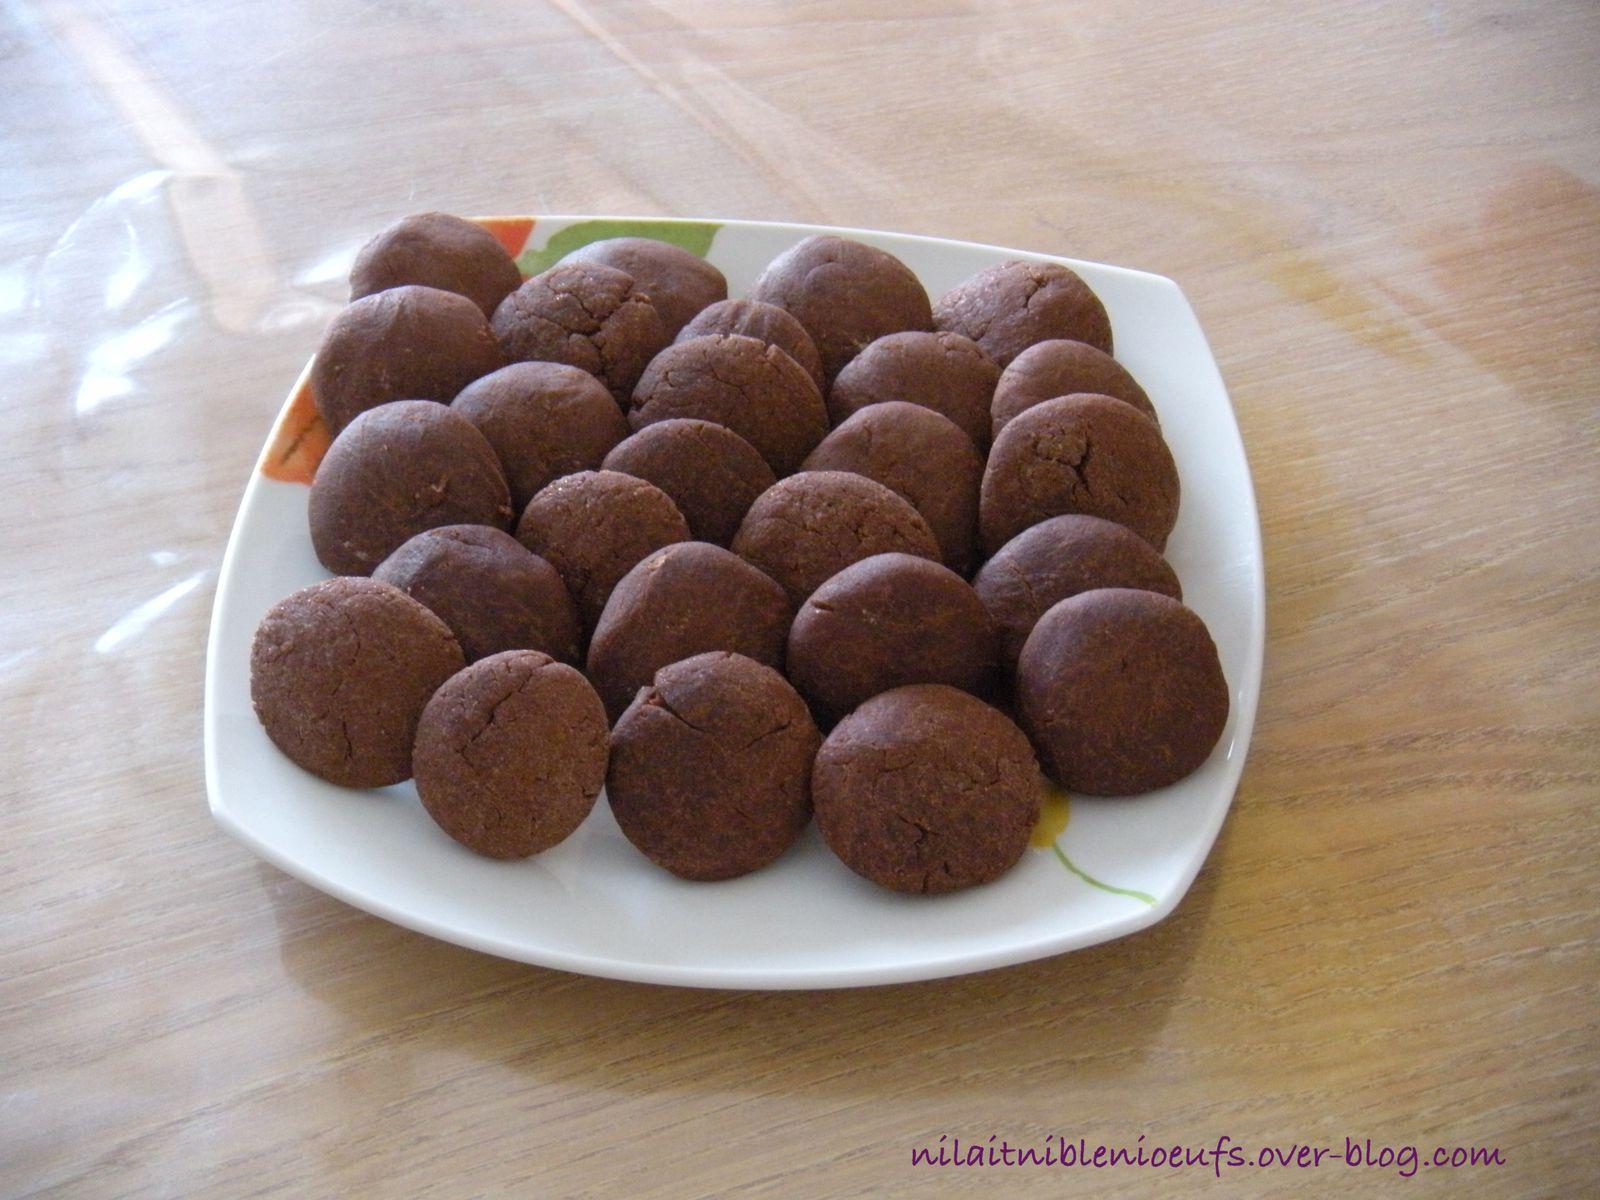 Petits biscuits au chocolat